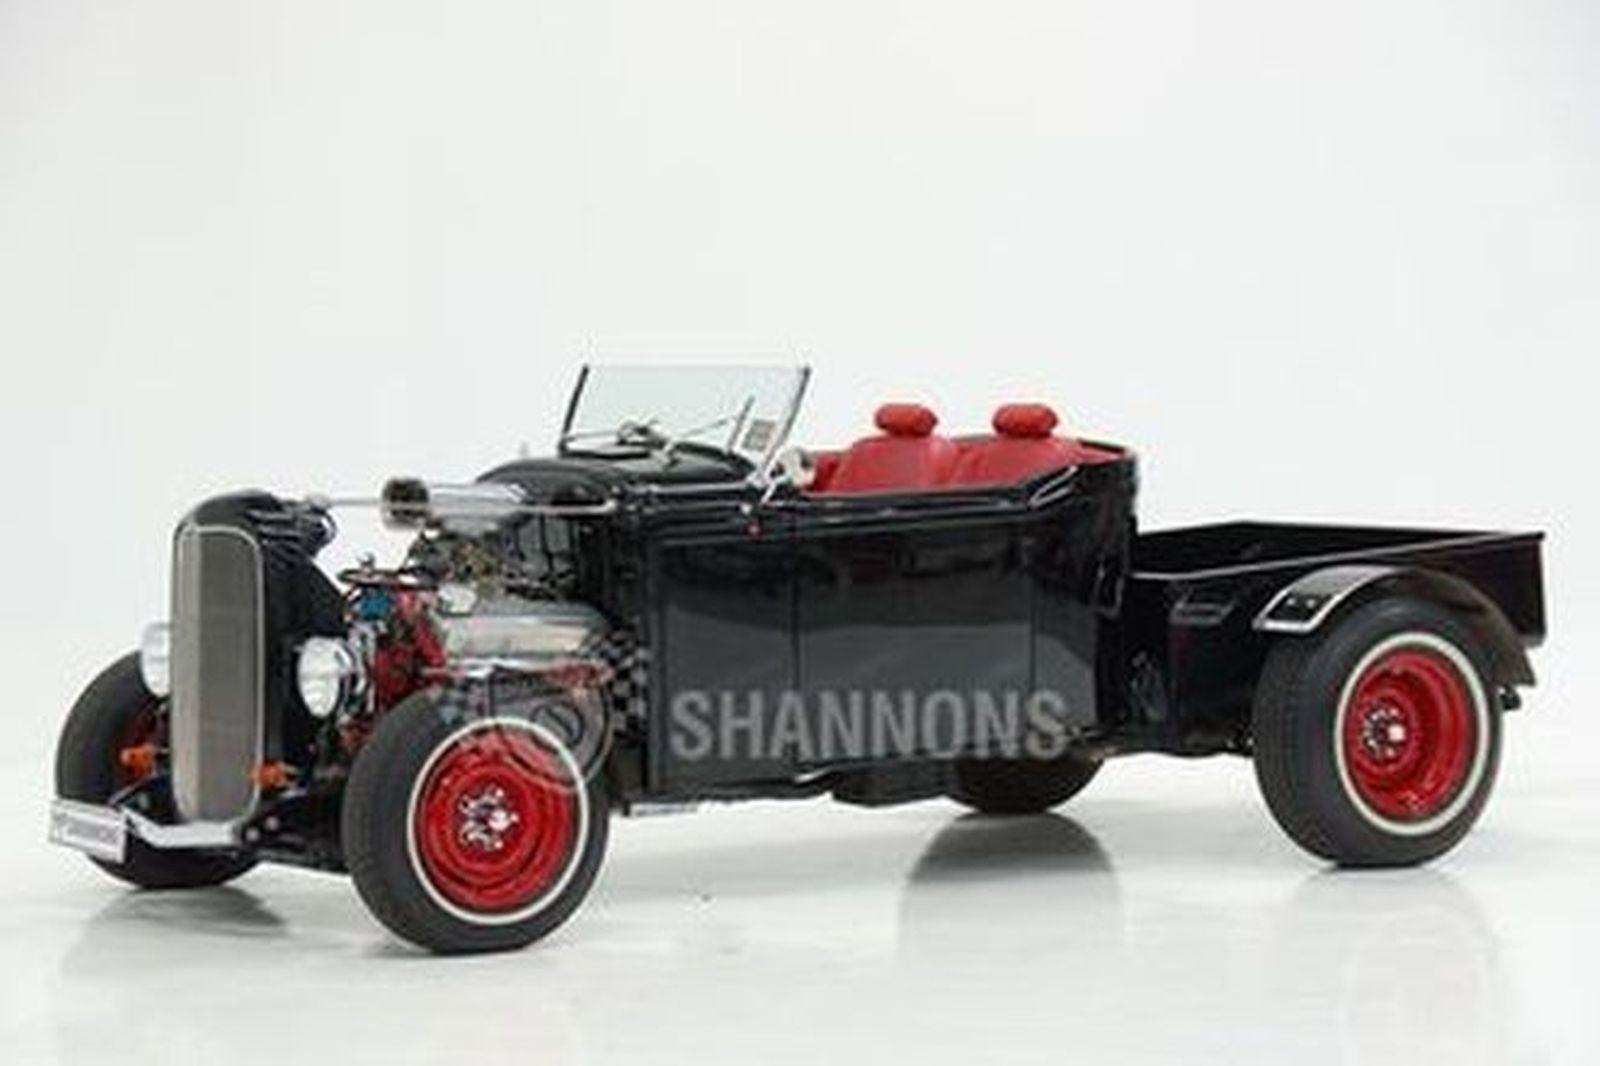 Ford 'Hot Rod' V8 Utility Pick-Up (RHD)